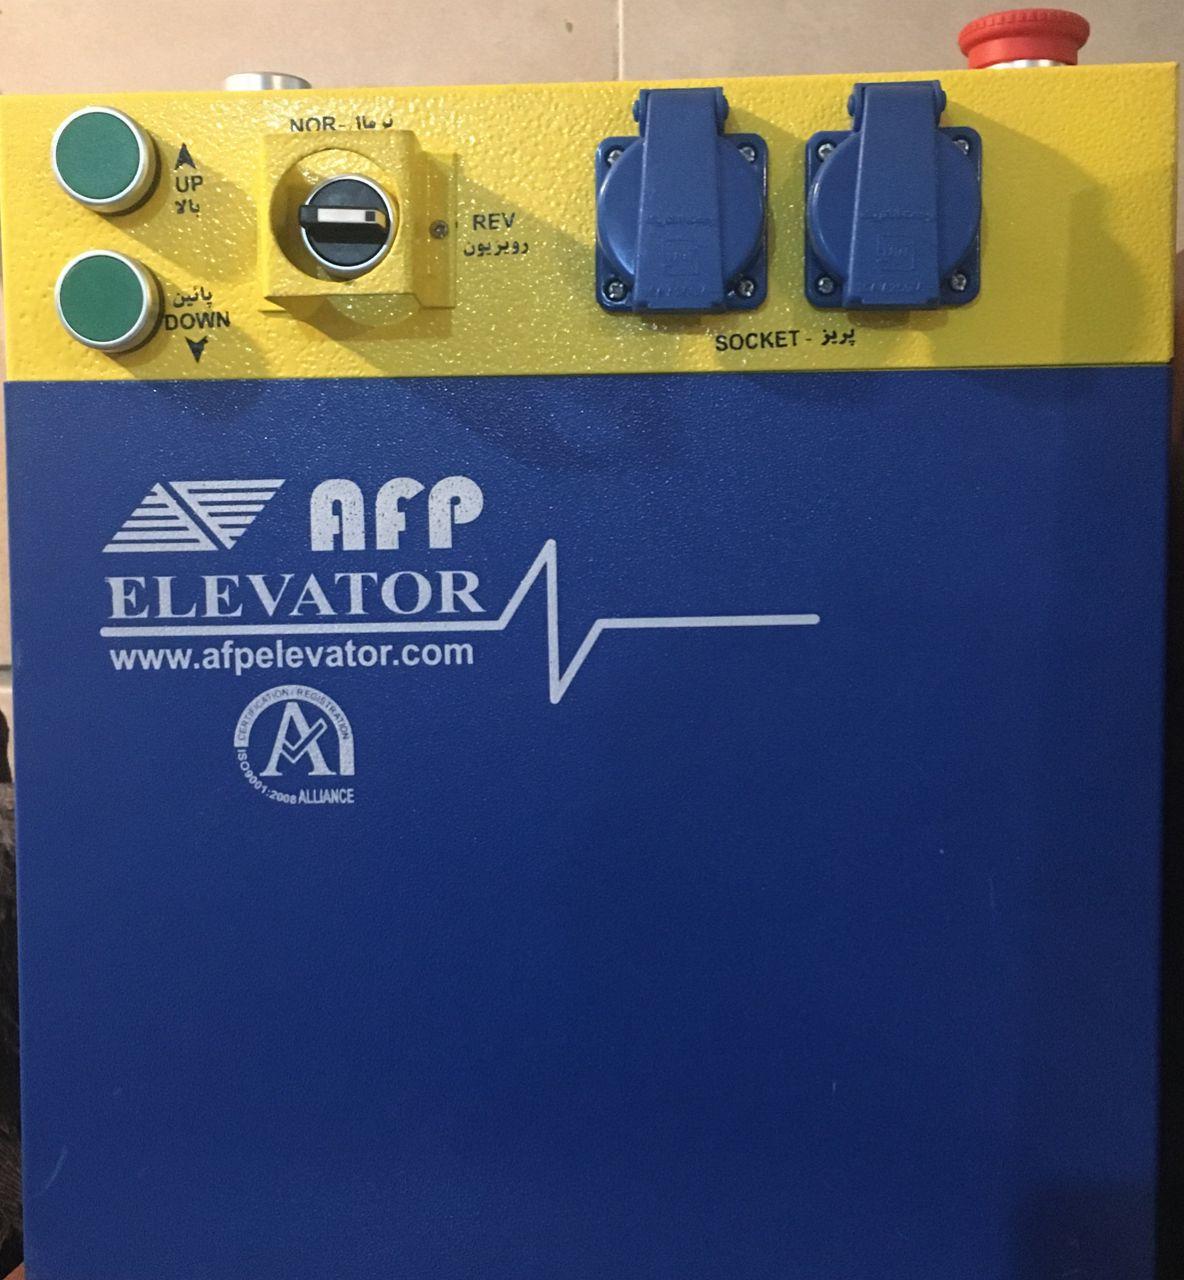 جعبه رویزیون آسانسور